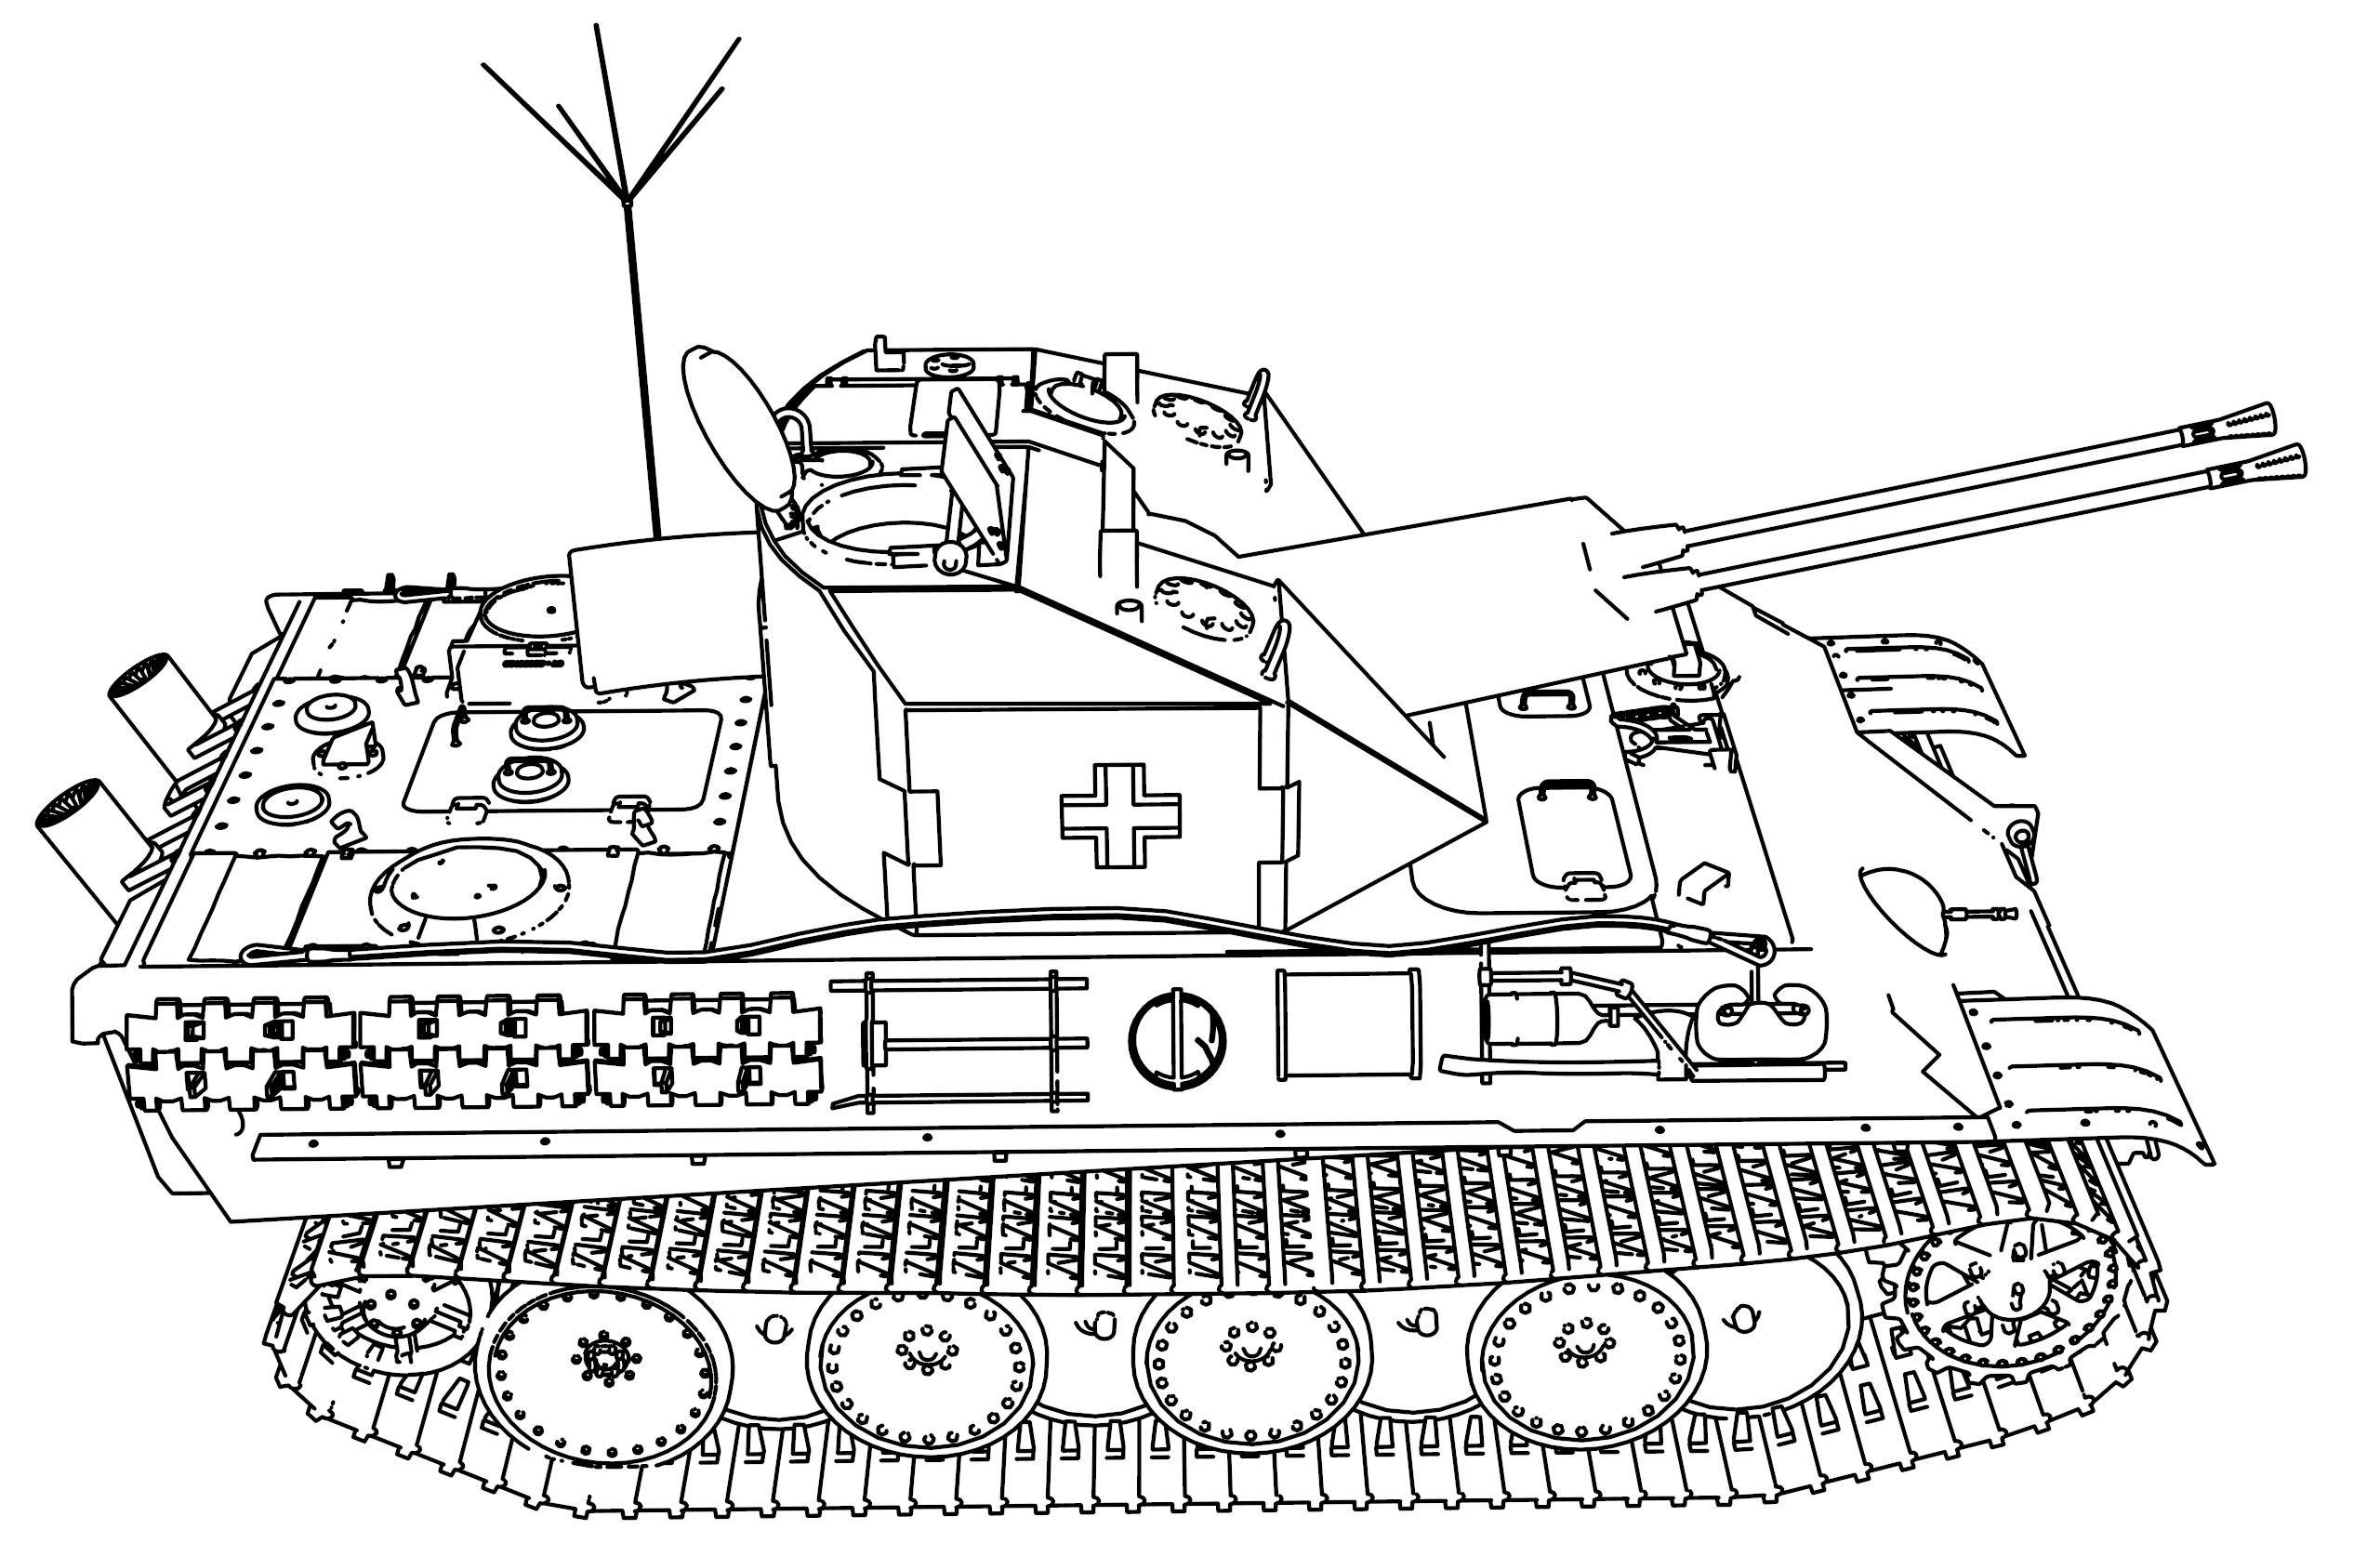 Panzer Coelian Military Tank Coloring Page Wecoloringpage Com Coloring Pages Truck Coloring Pages Tanks Military